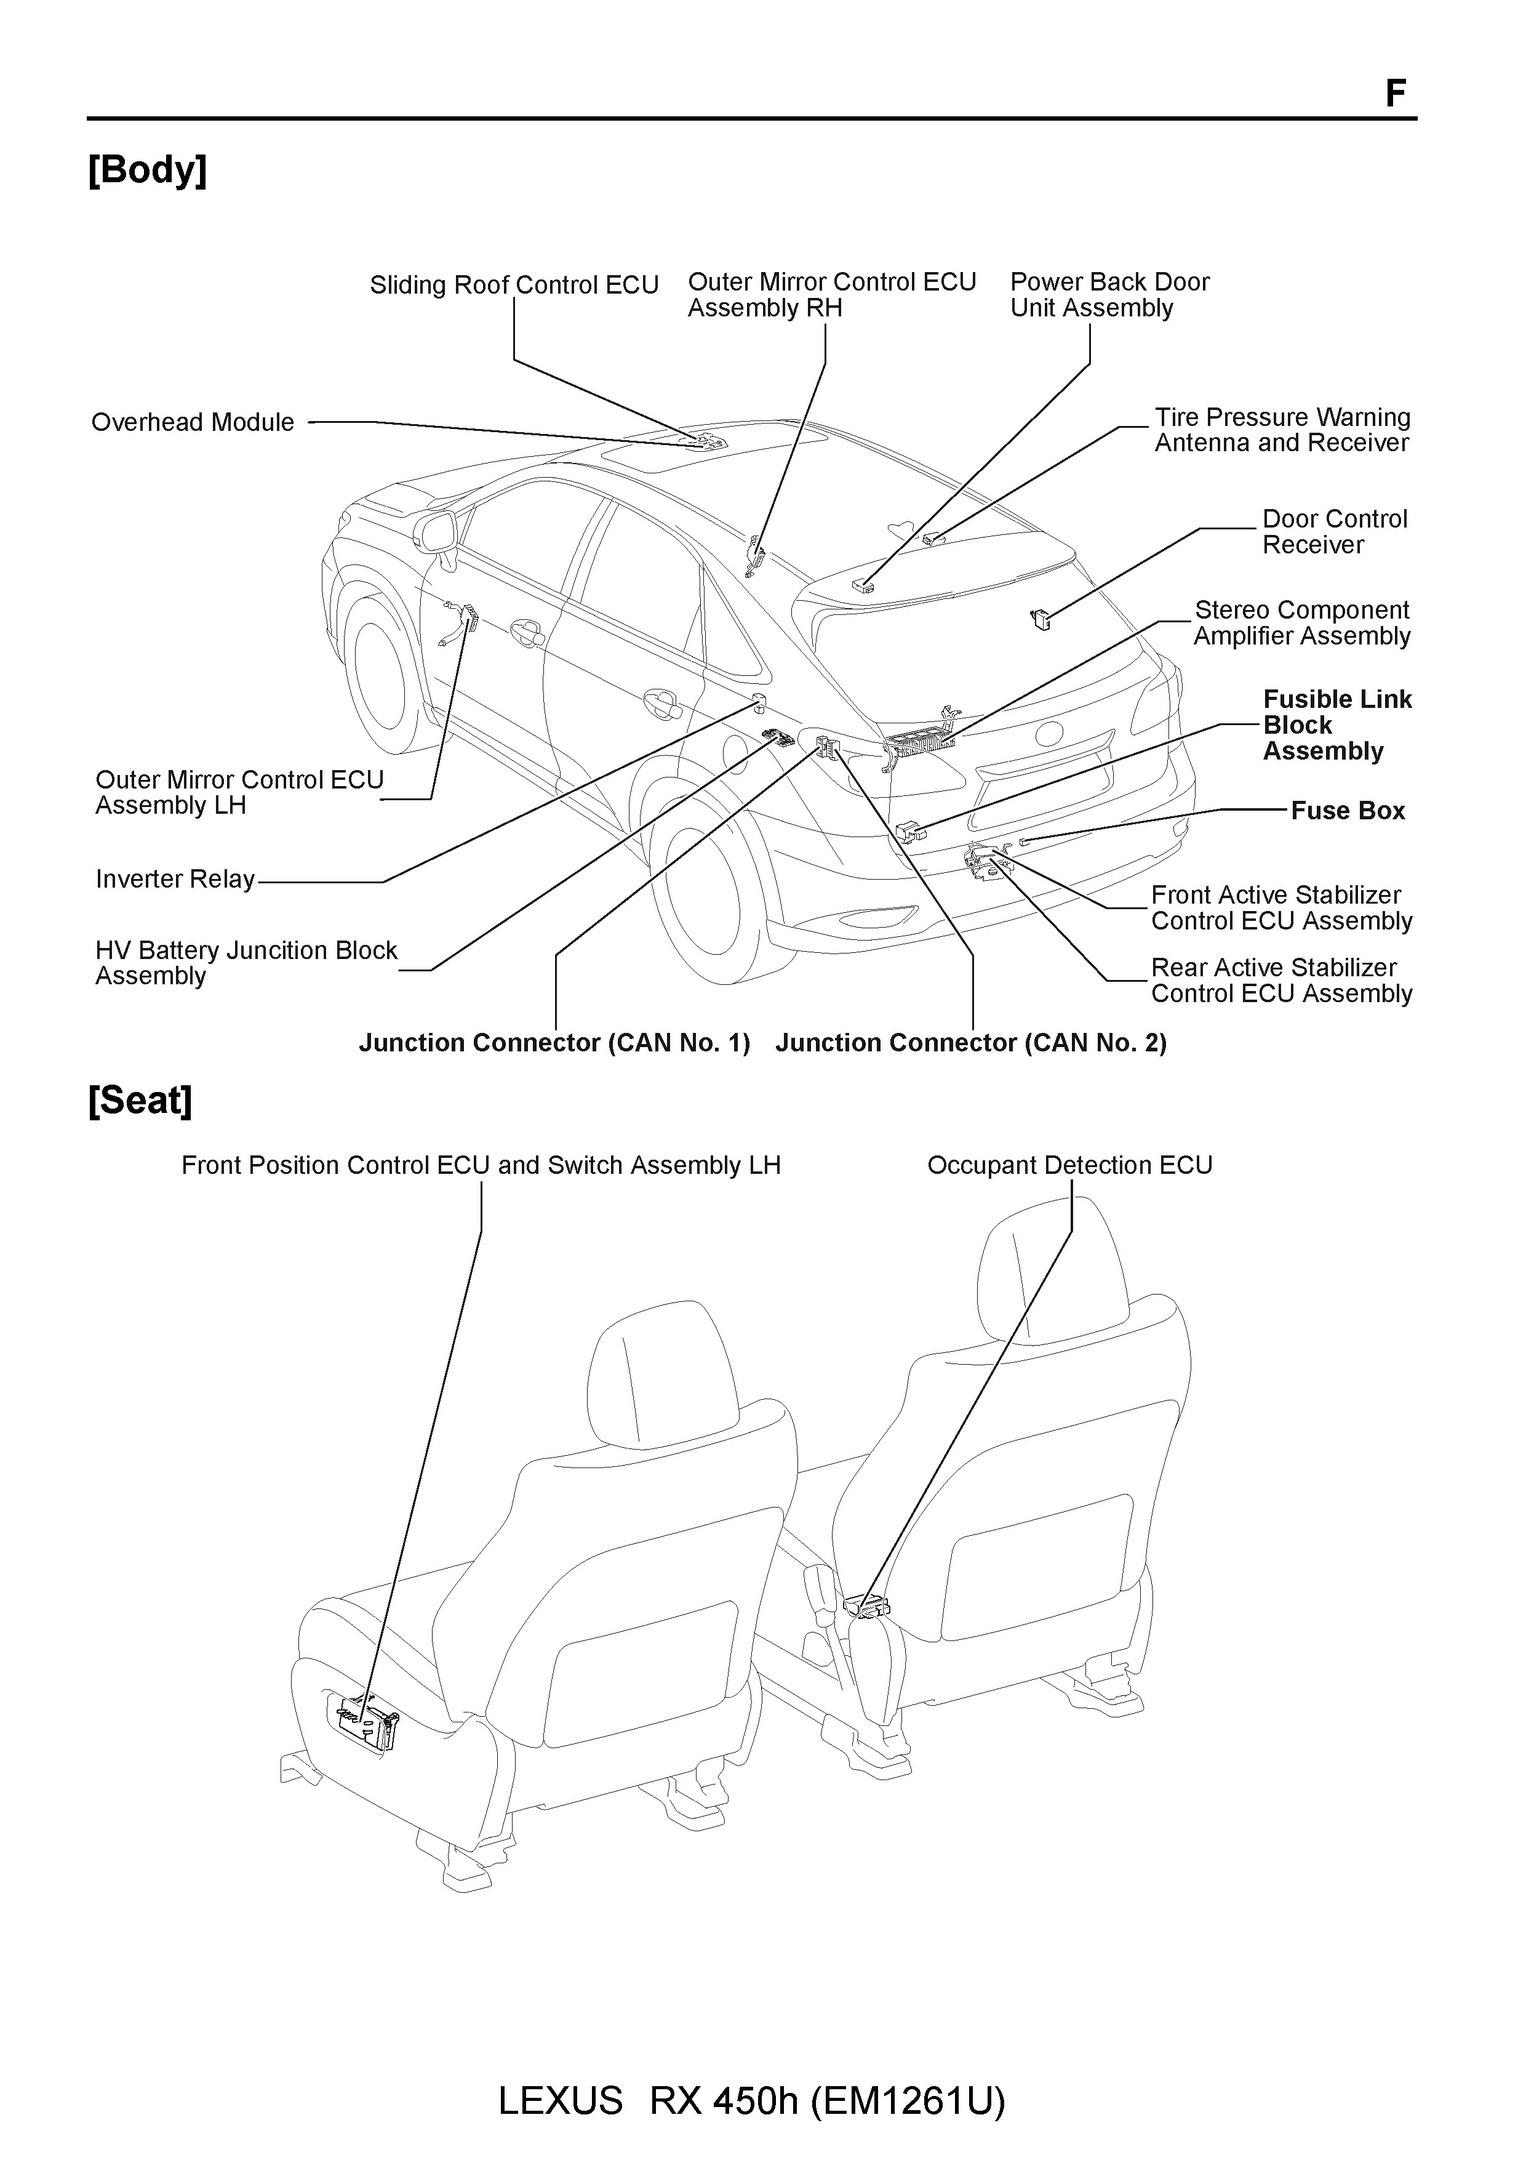 hight resolution of free 2009 lexus rx450h oem electrical wiring diagram pdf